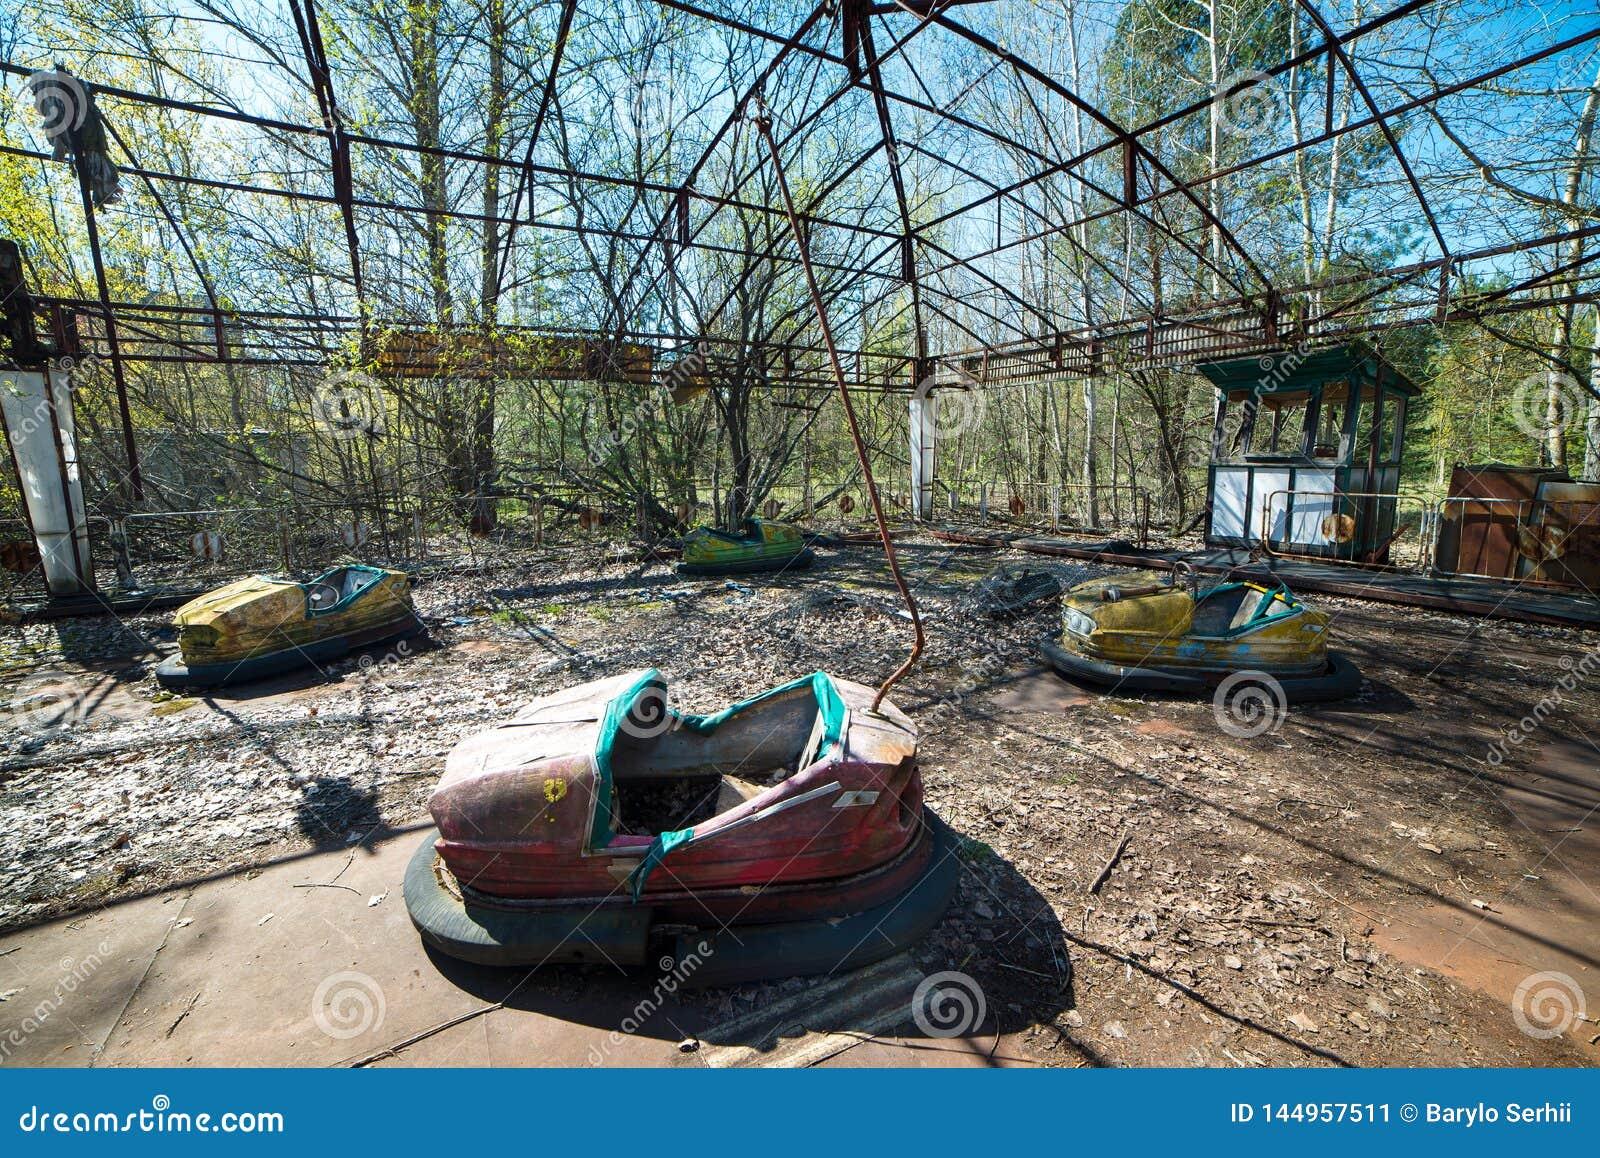 Abandoned Amusement Park In Pripyat Chernobyl Alienation Zone Stock Image Image Of Catastrophe Destruction 144957511